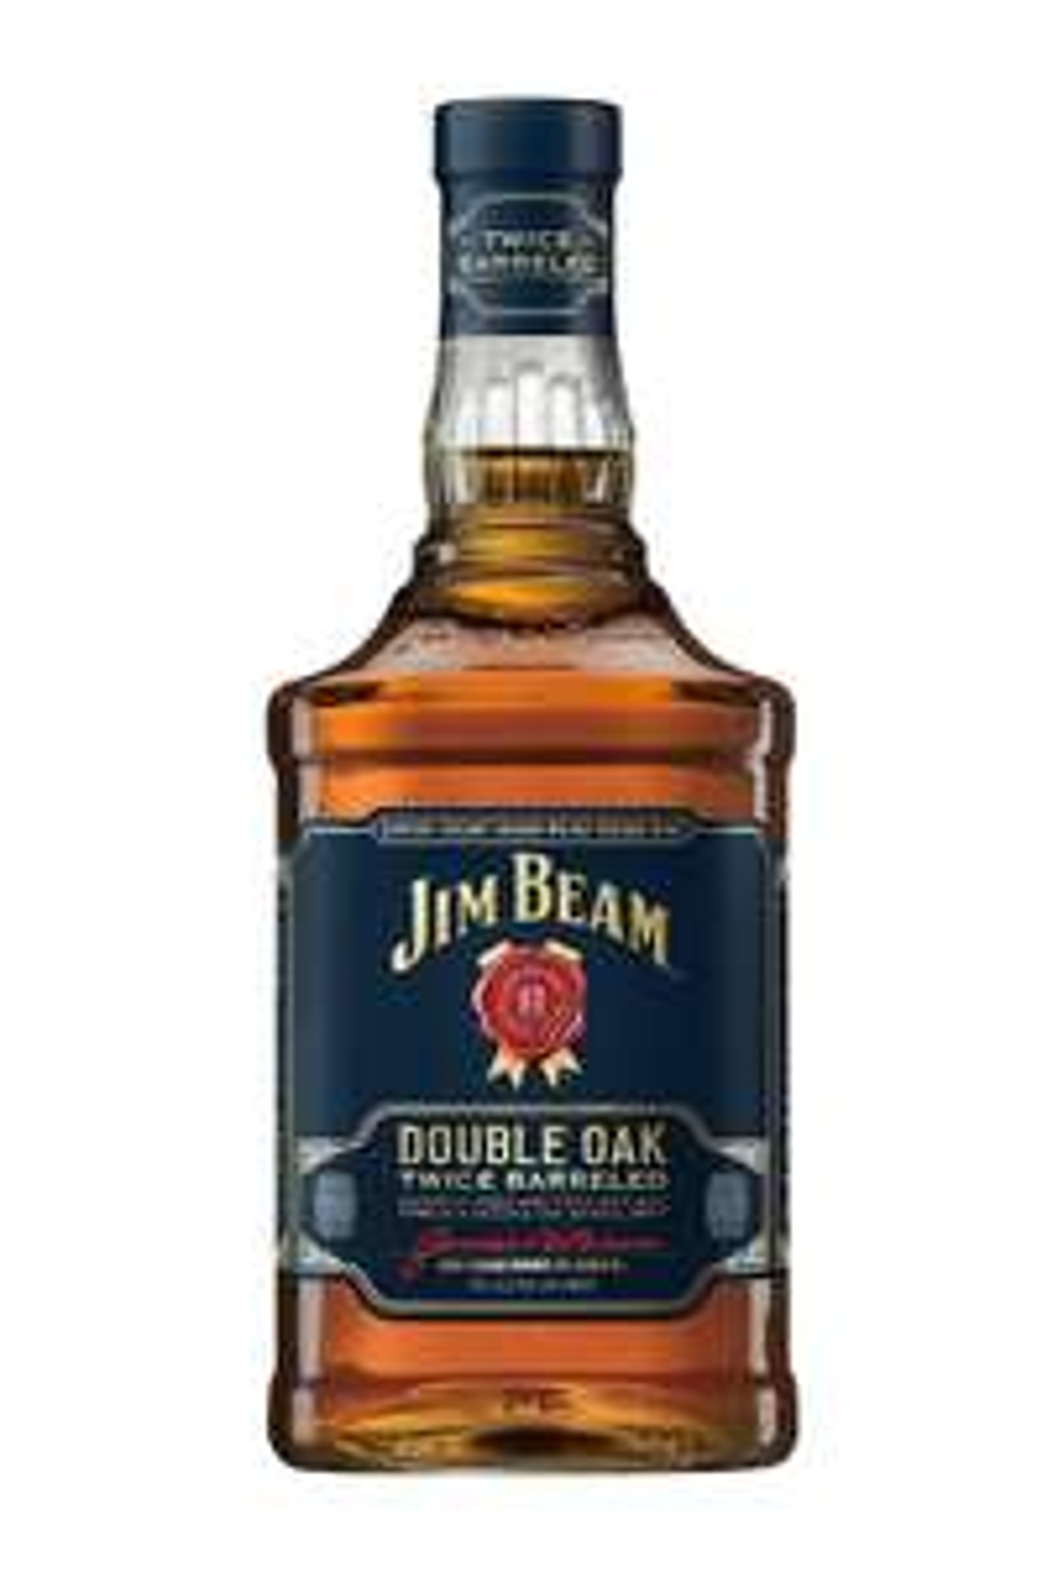 Jim Beam Double Oak Kentucky Straight Whiskey, 70 cl - £20 @ Amazon